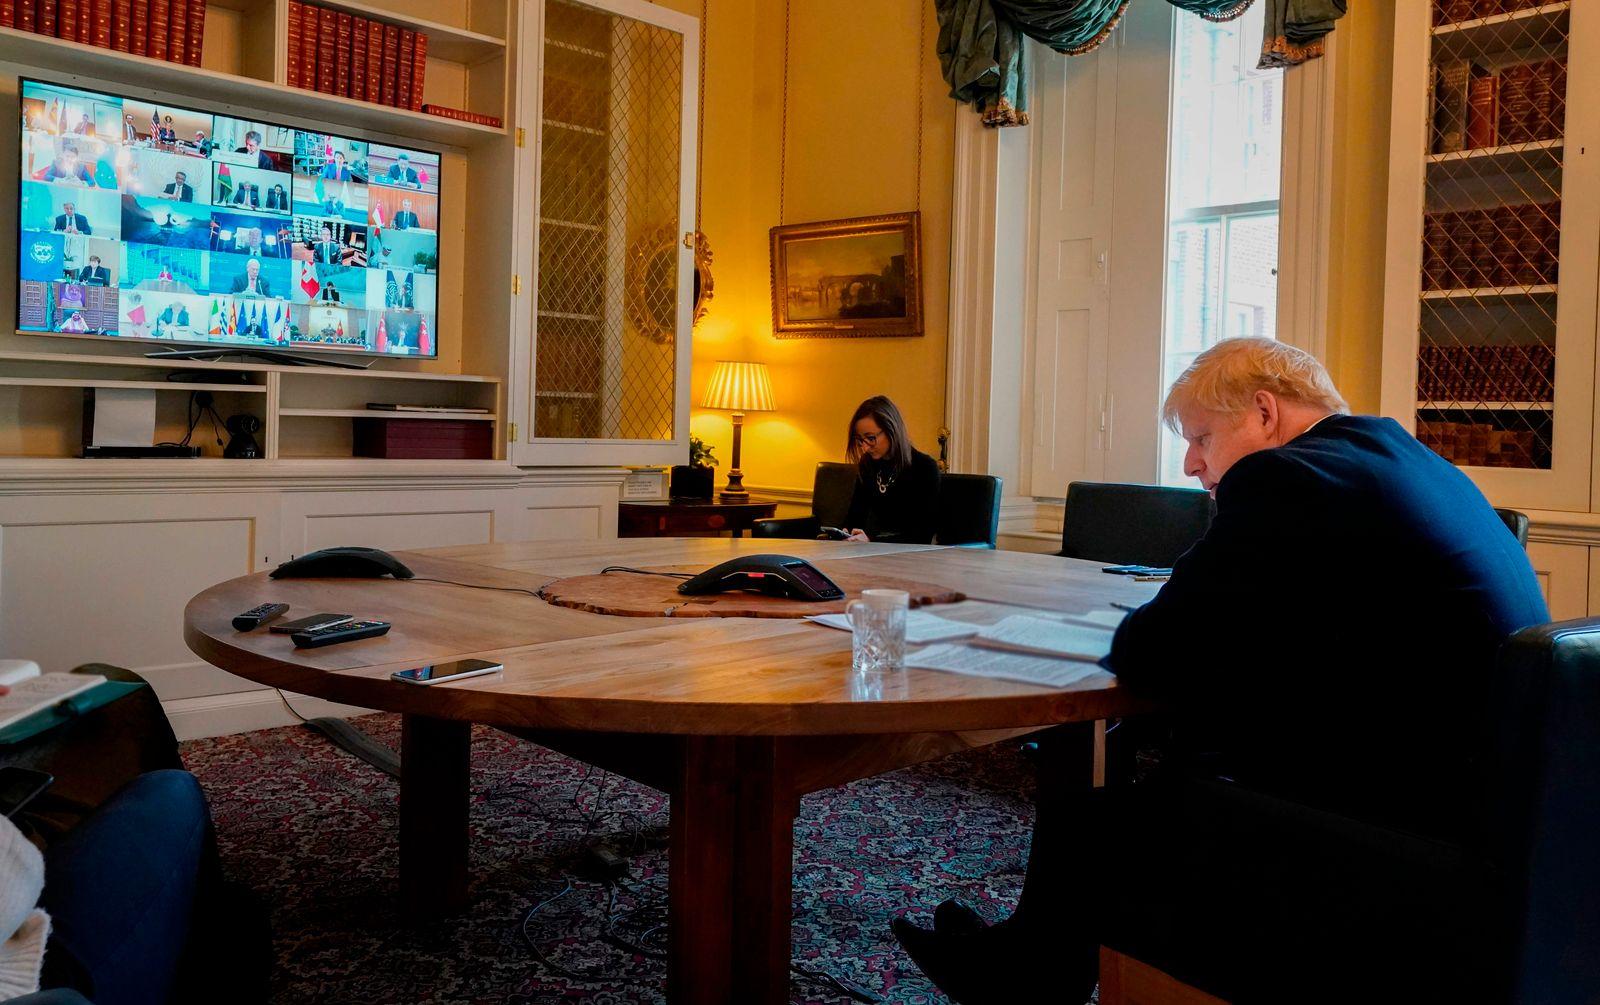 FILES-BRITAIN-HEALTH-VIRUS-POLITICS-JOHNSON